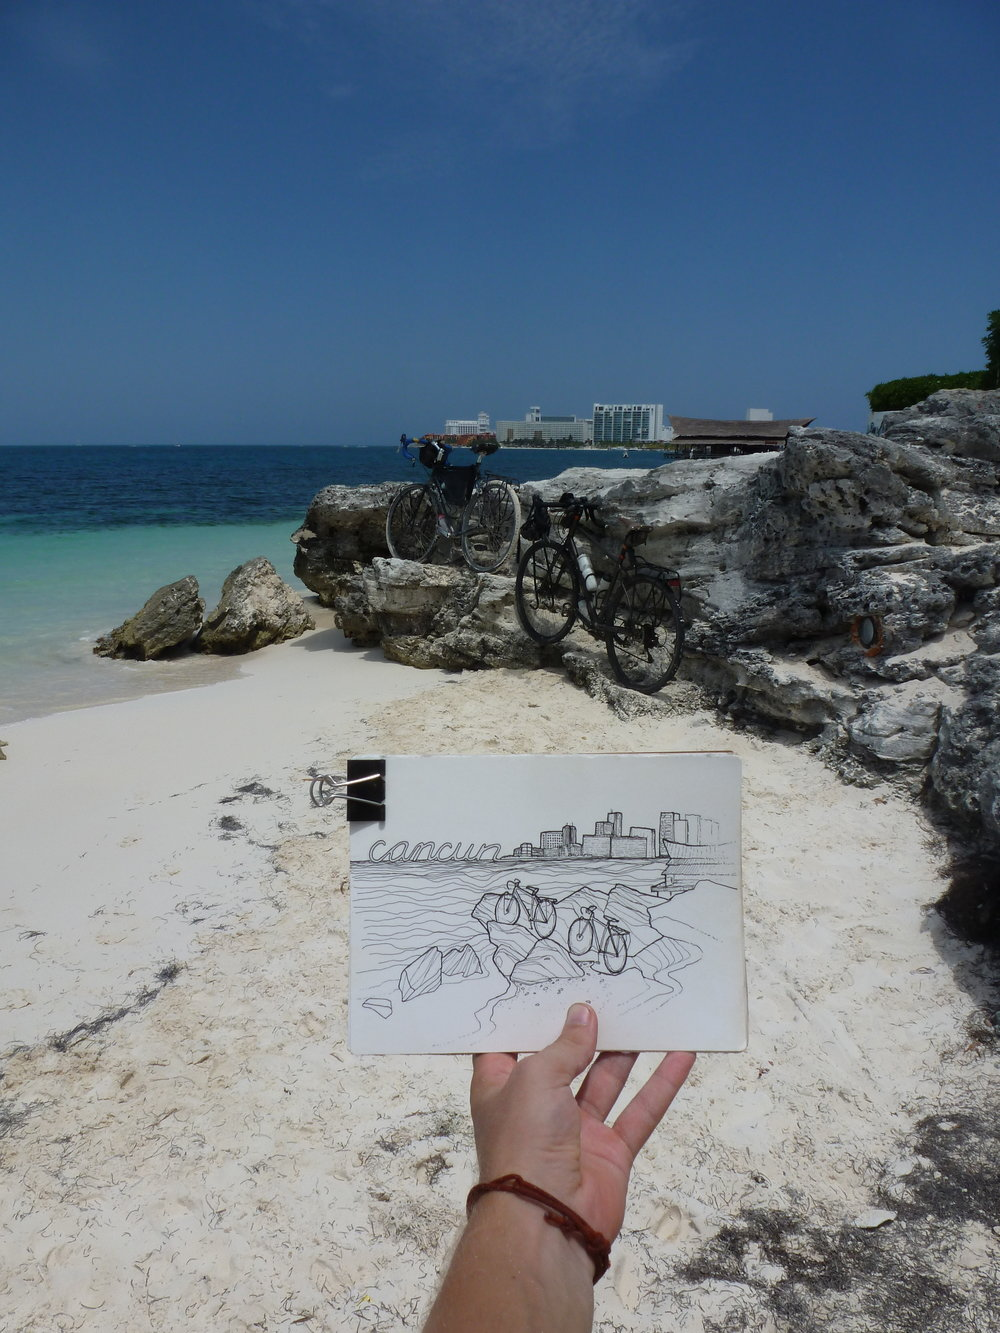 Cancun, Quintana Roo